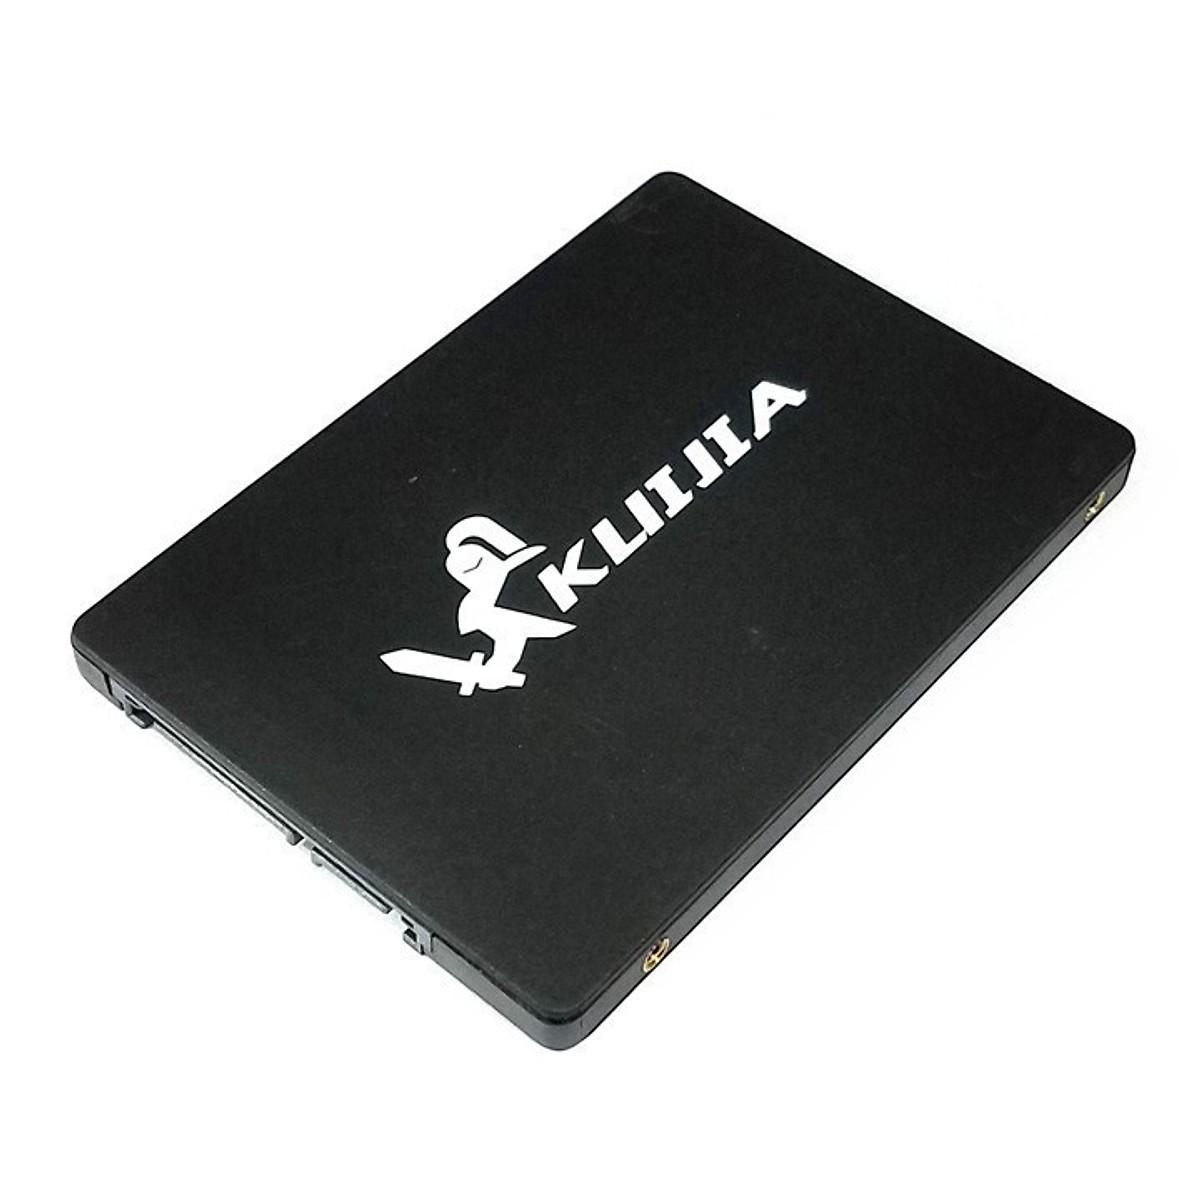 Ổ cứng SSD 120G KUIJIA